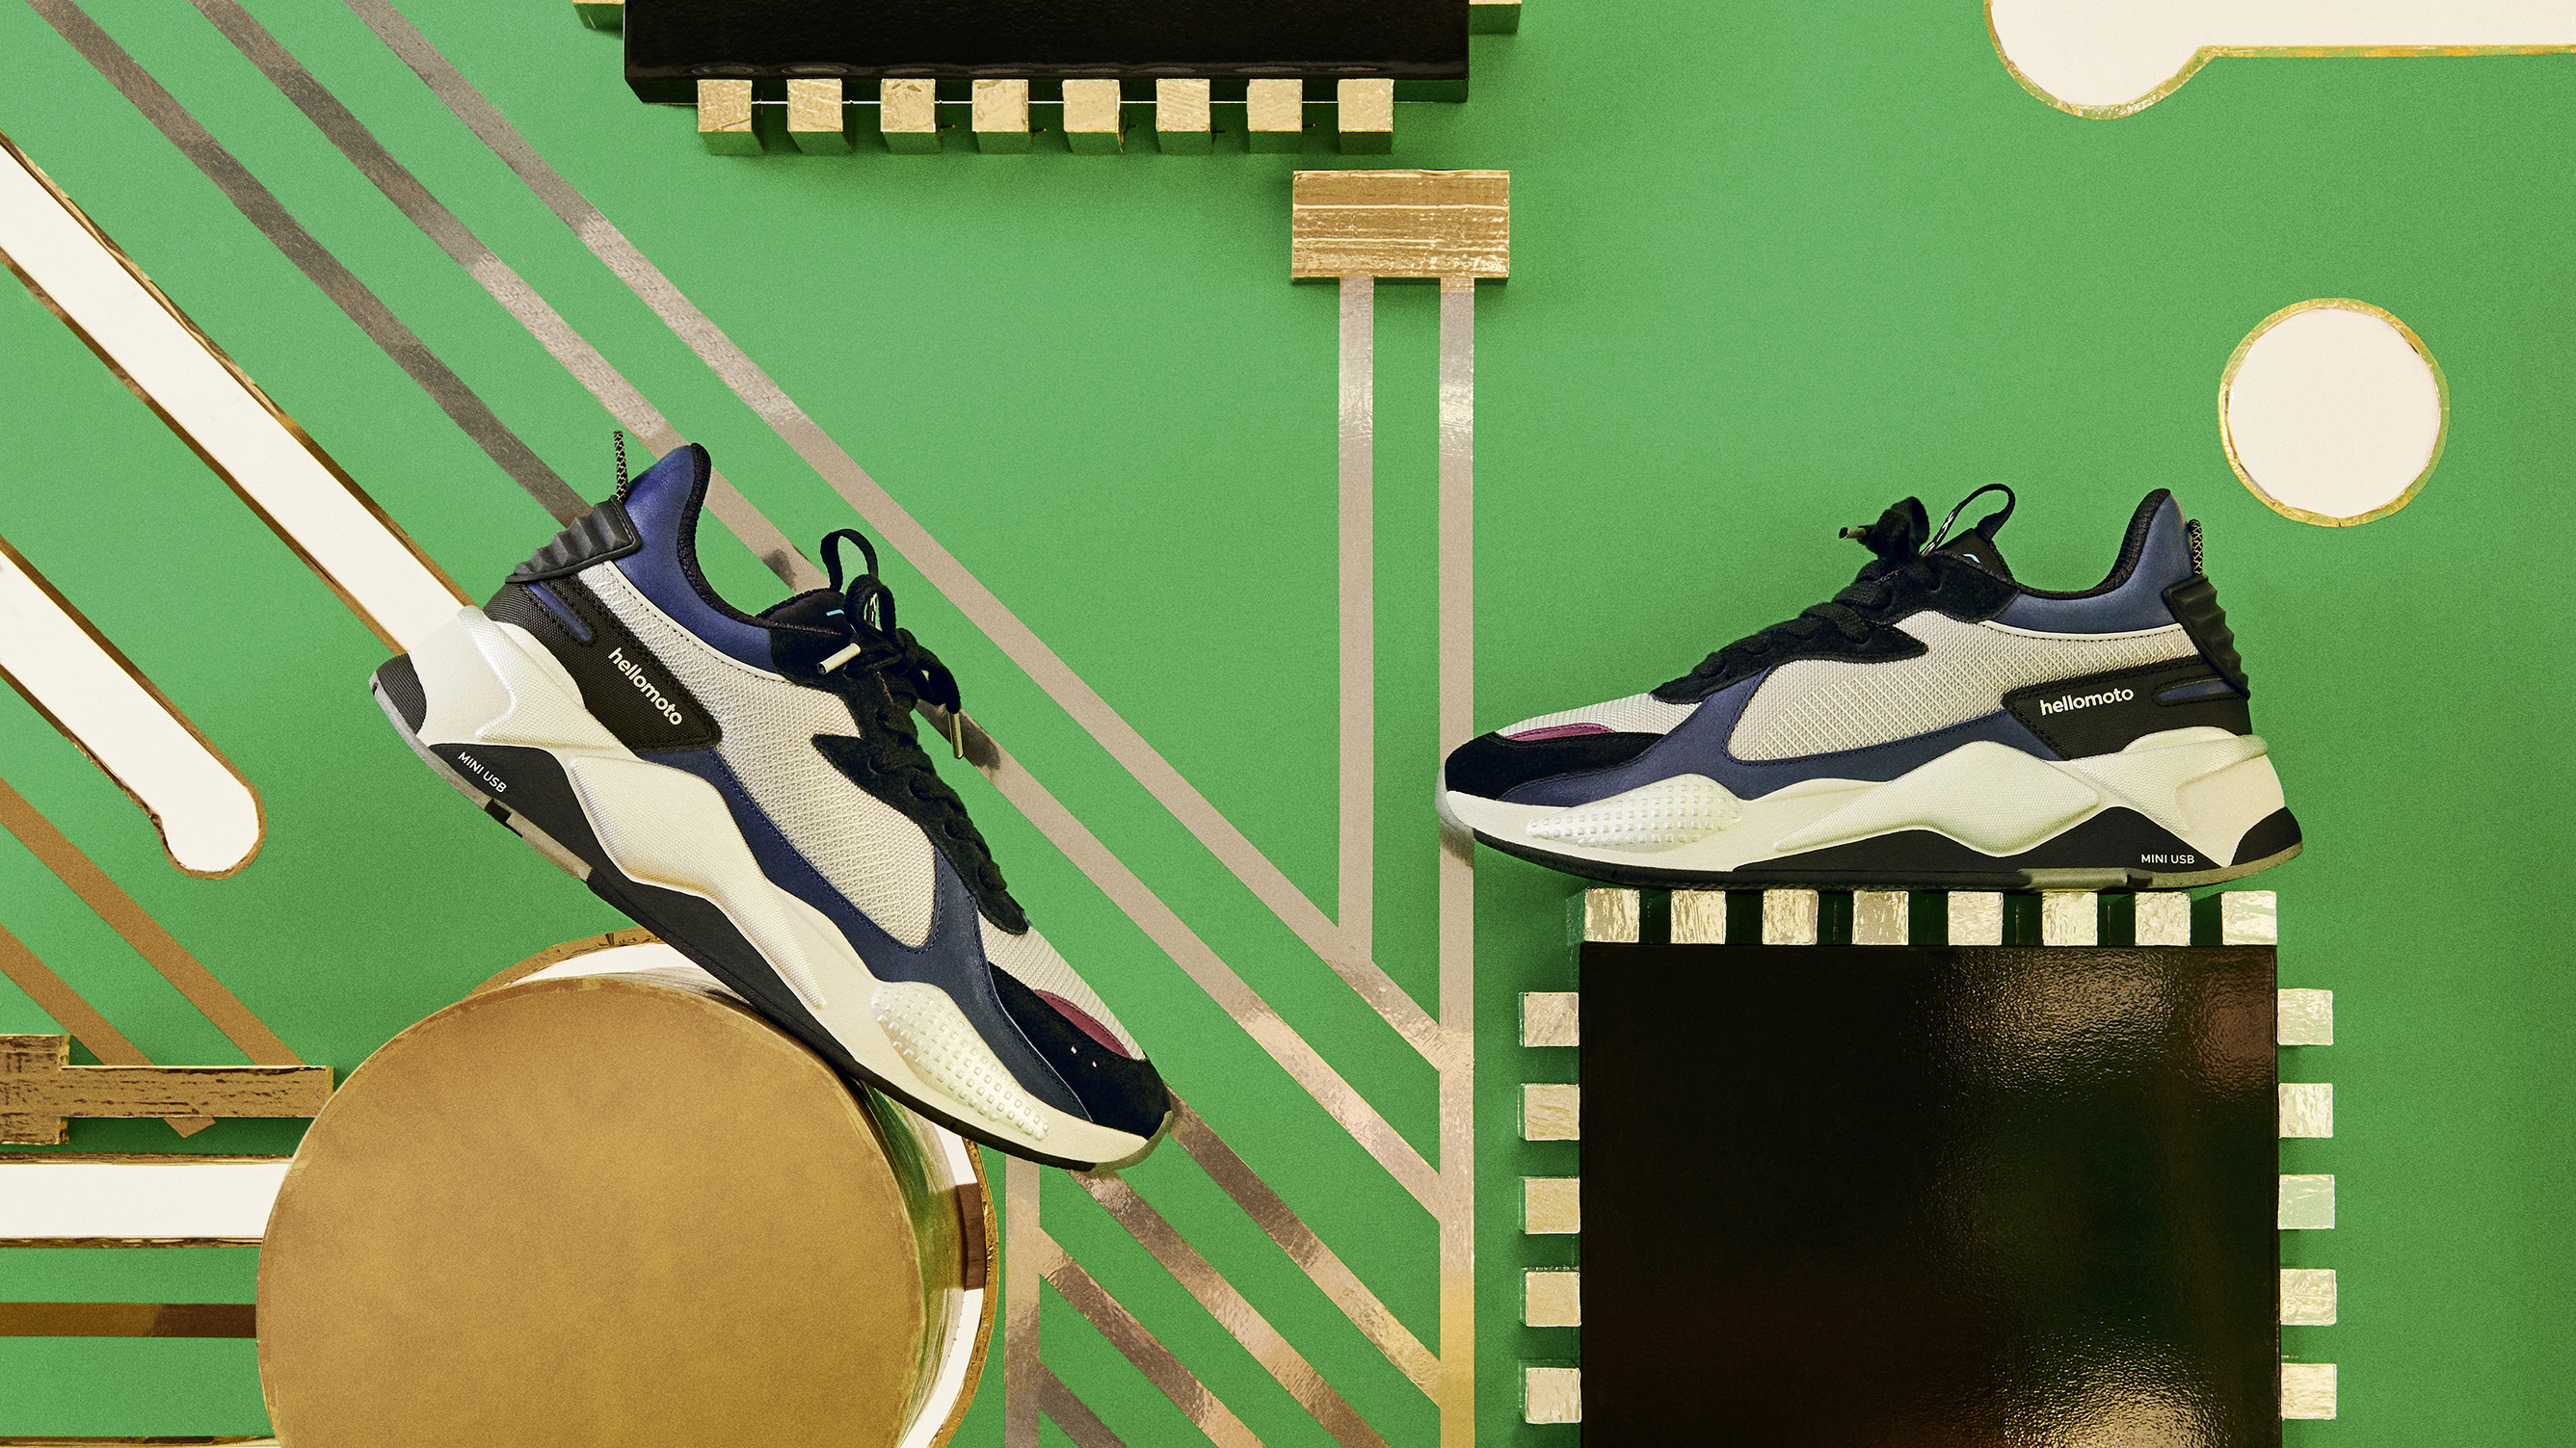 e3080980b9b Puma teams up with Motorola for retro tech-inspired sneaker | T3